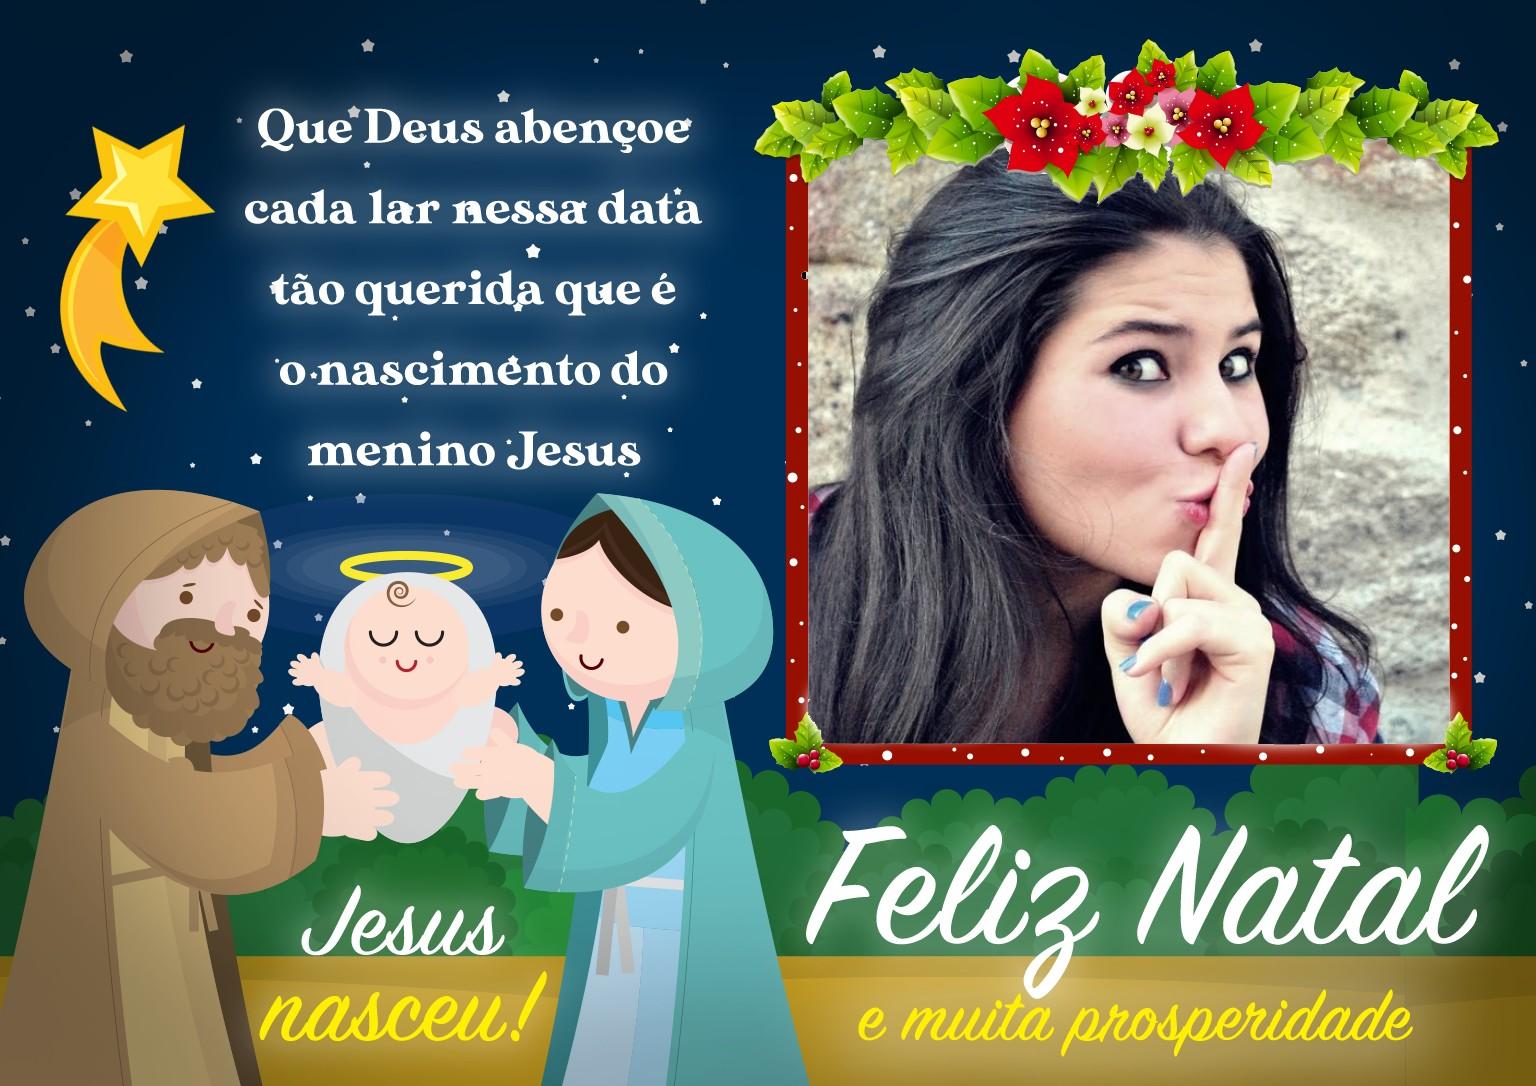 foto-moldura-presepio-natalino-jesus-nasceu